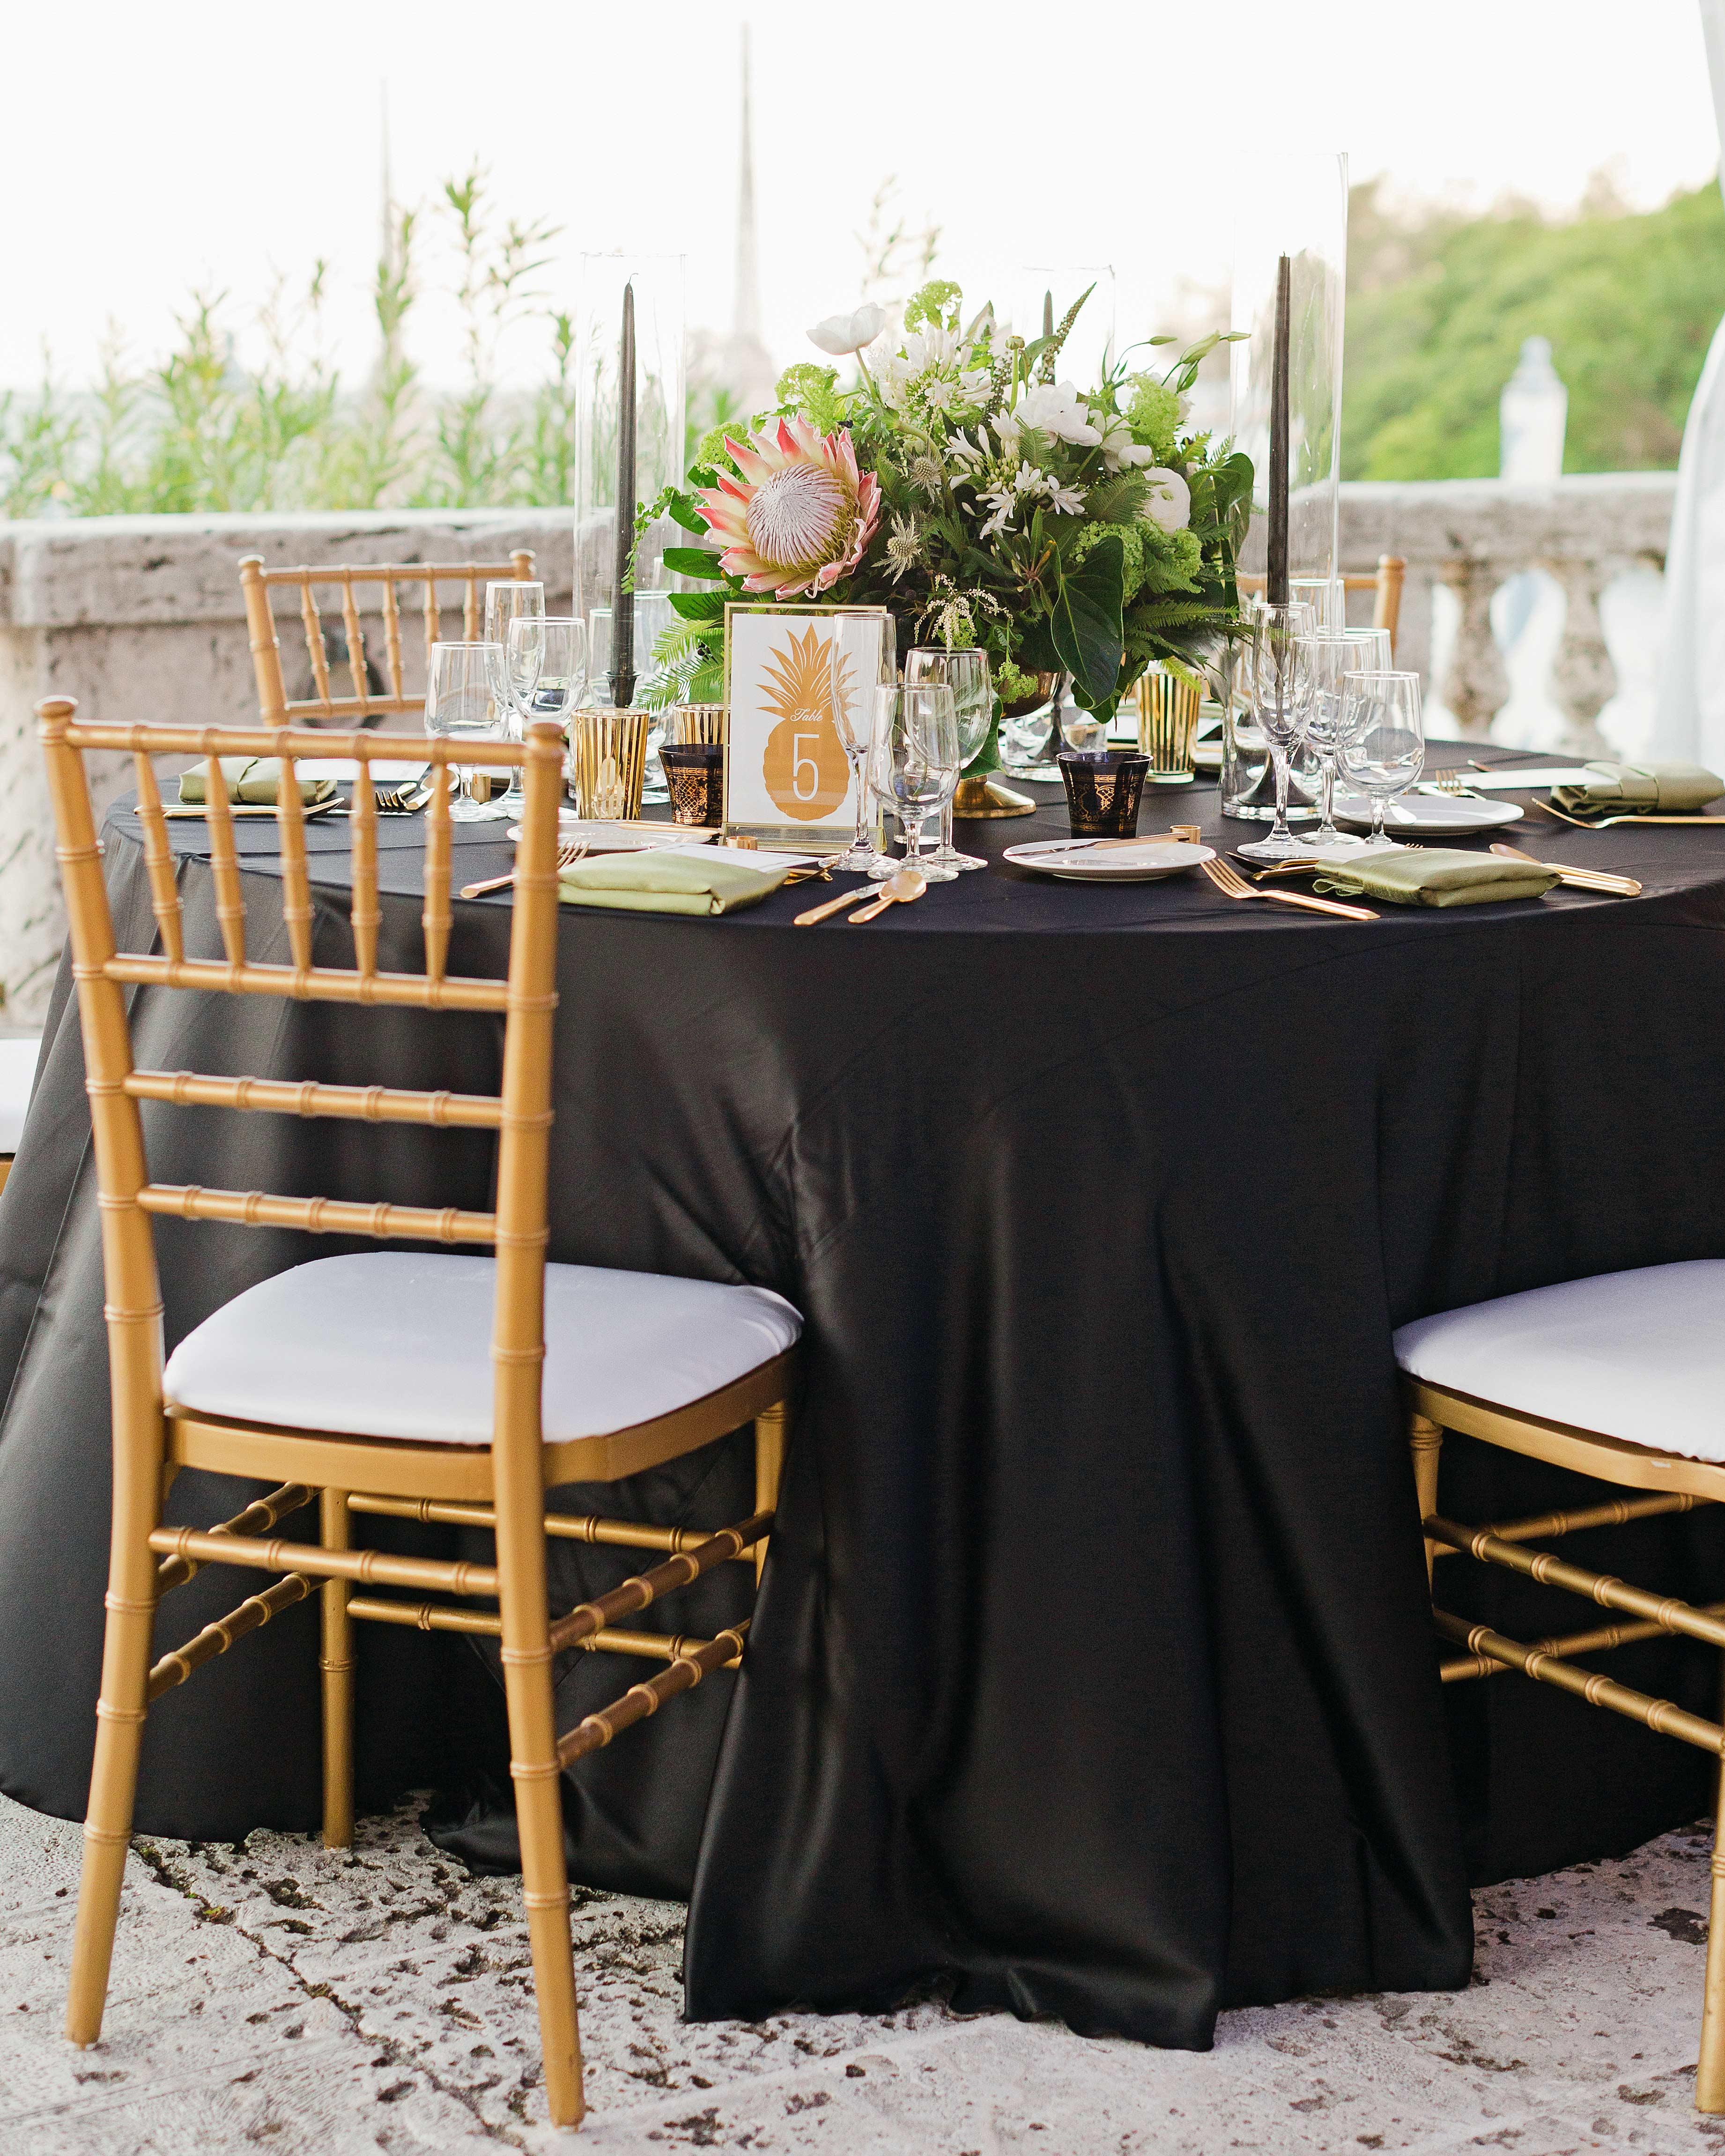 brette patrick wedding table setting